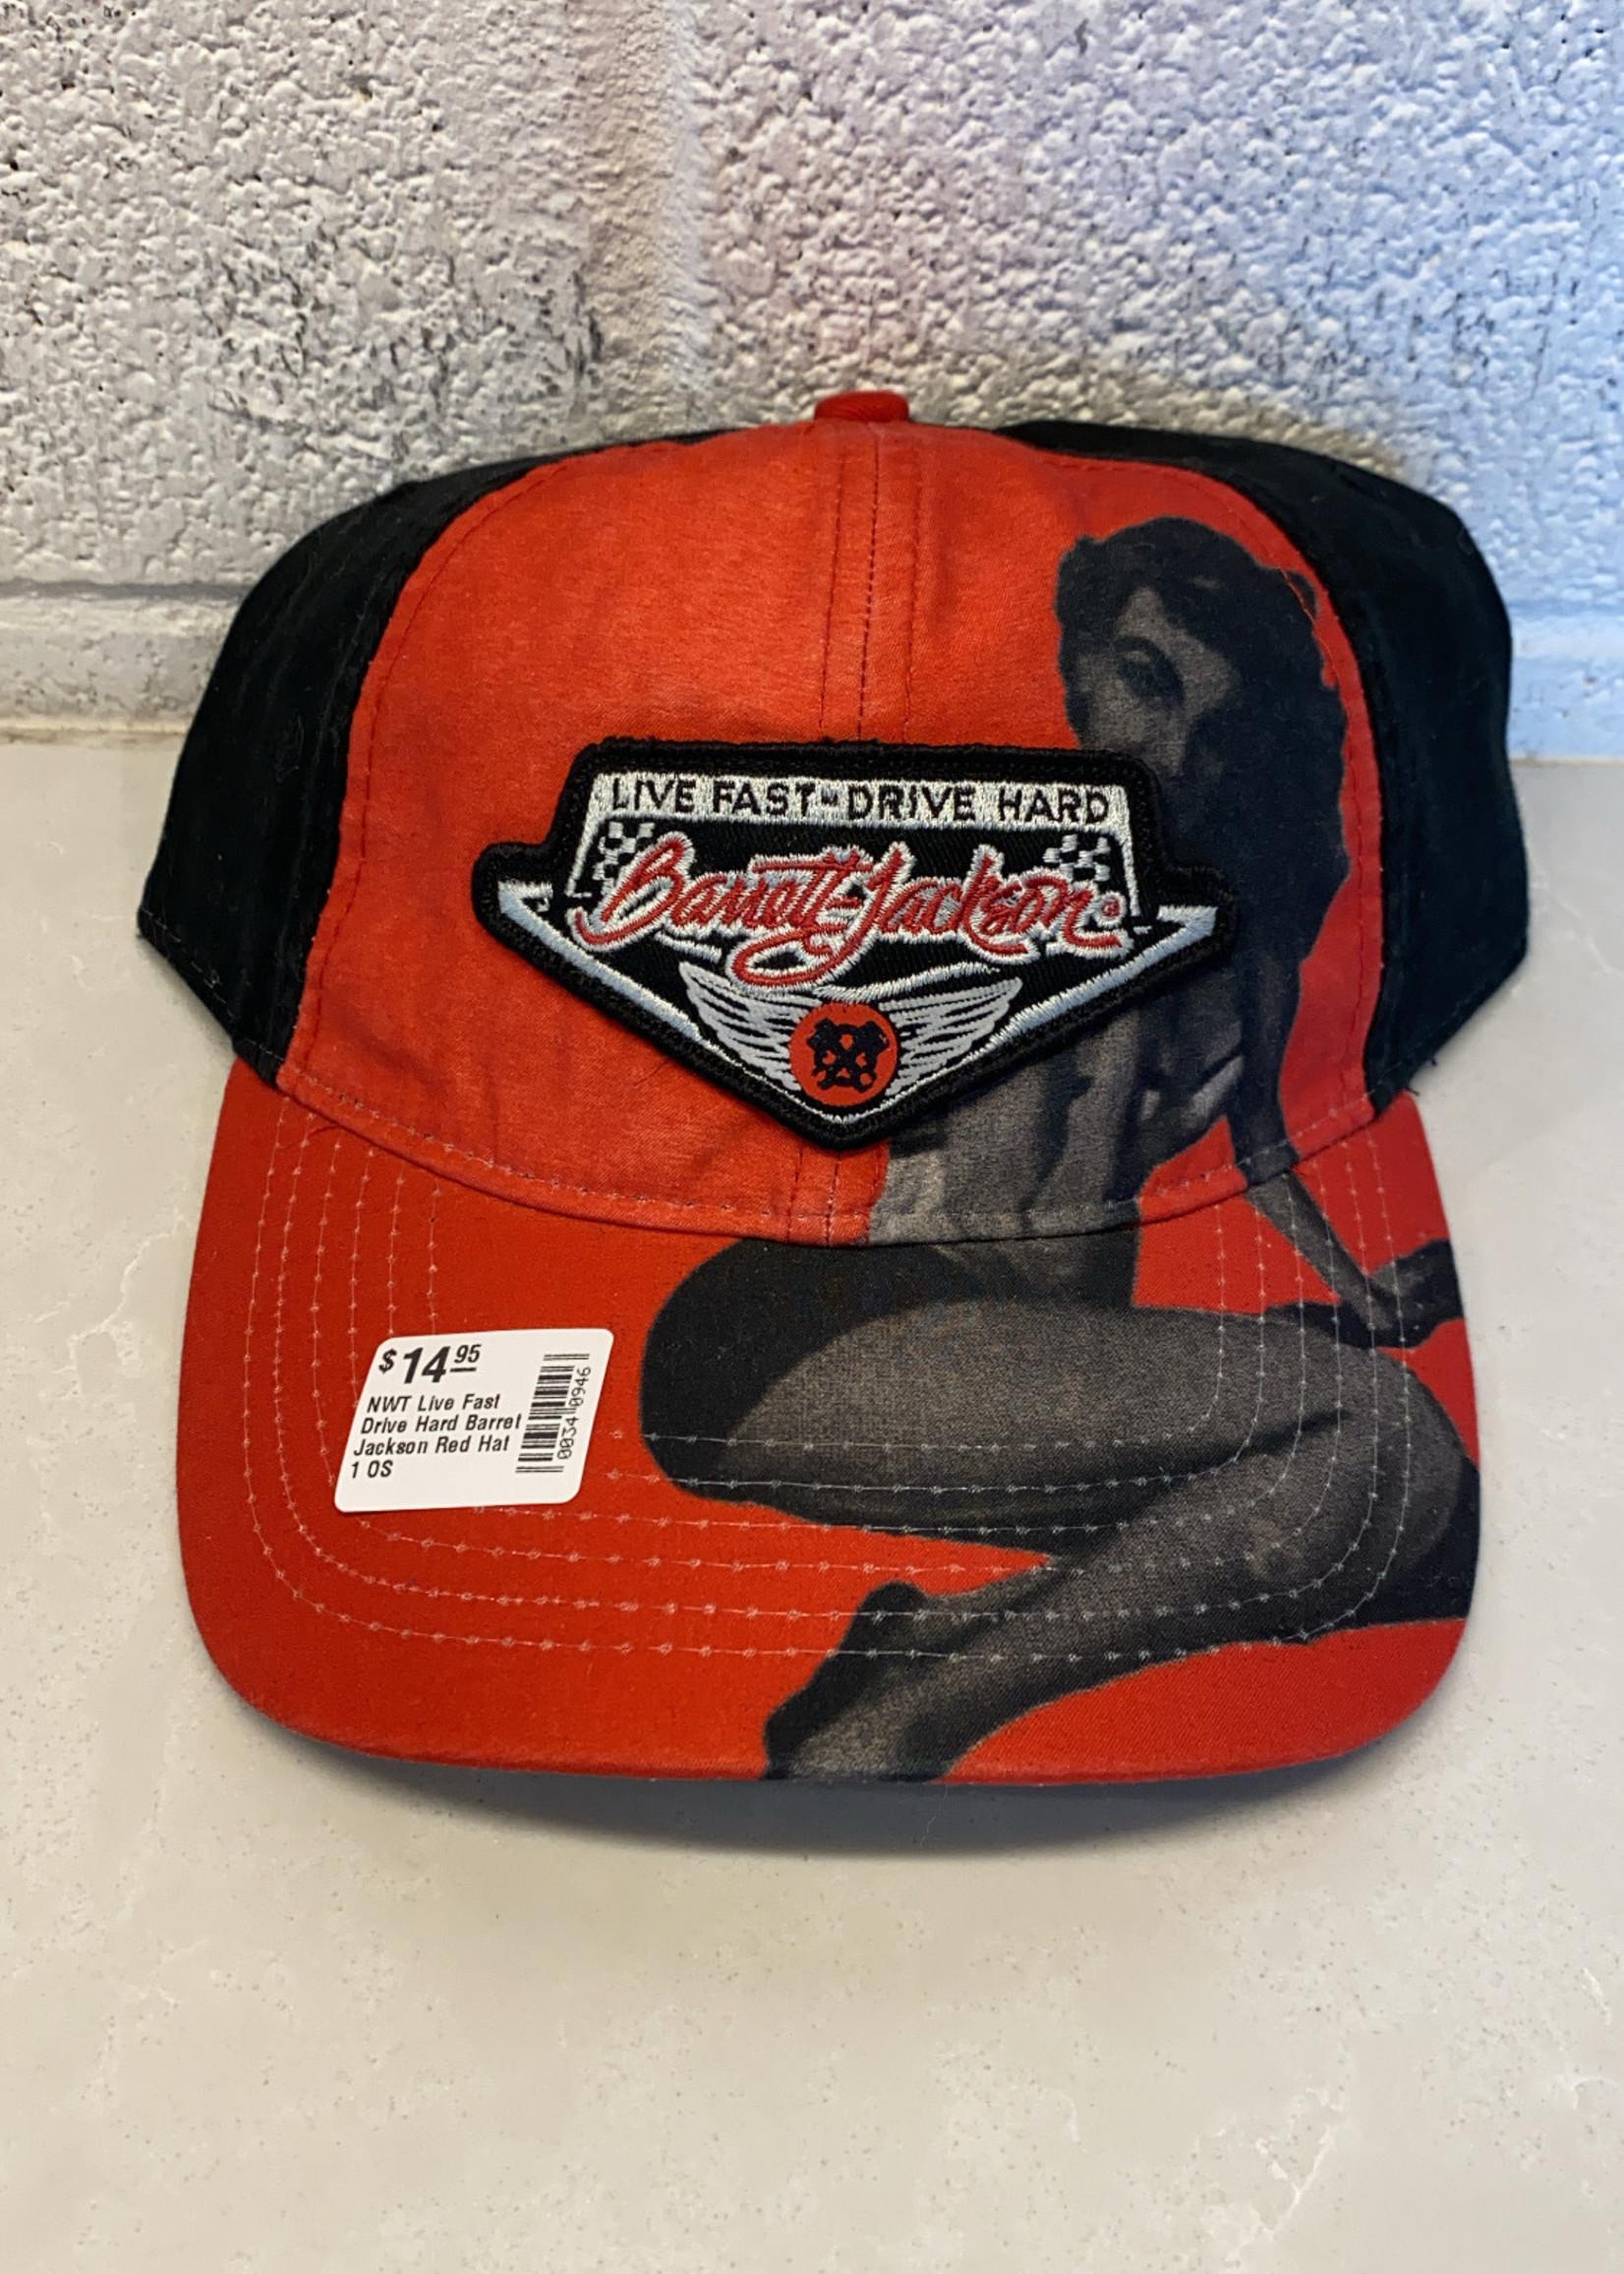 NWT Live Fast Drive Hard Barret Jackson Red Hat